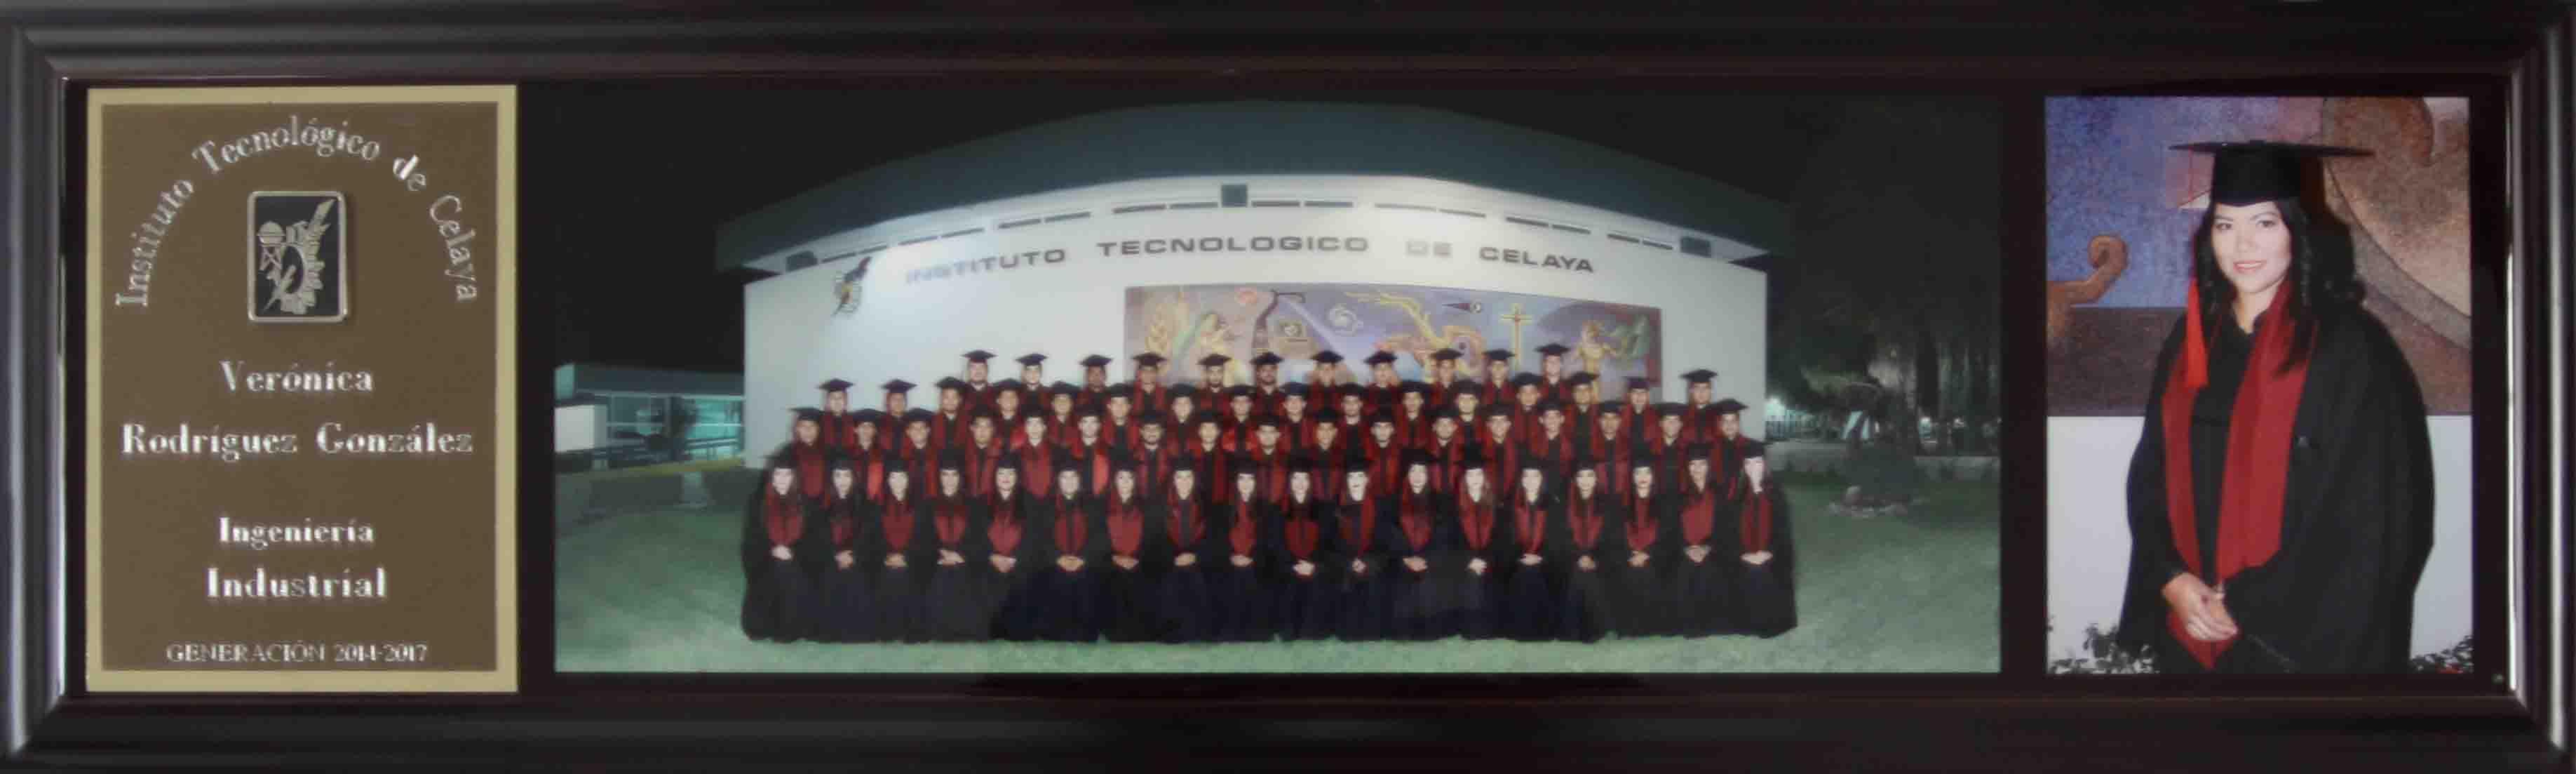 Paquetes de Graduación en Querétaro | Contrato desde $55 Pesos